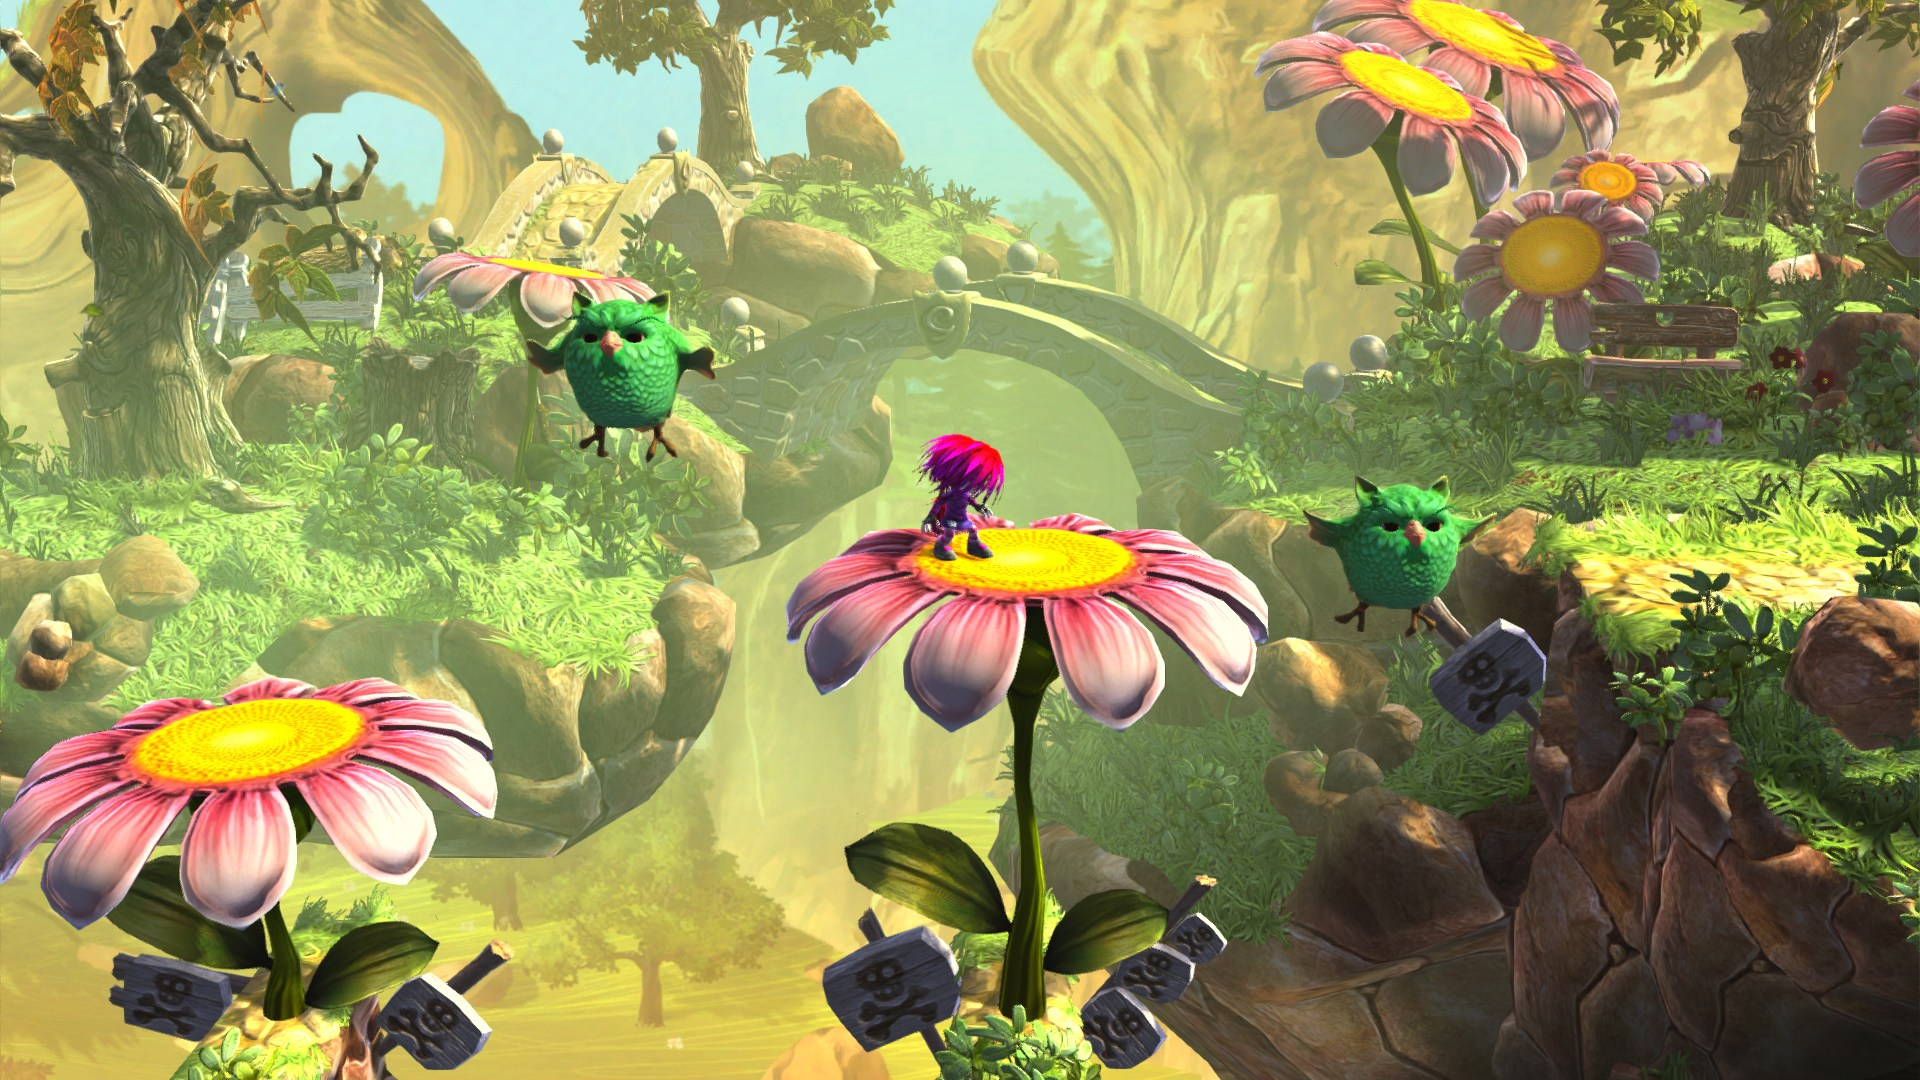 Wii U Indie Game Review: Giana Sisters – Twisted Dreams